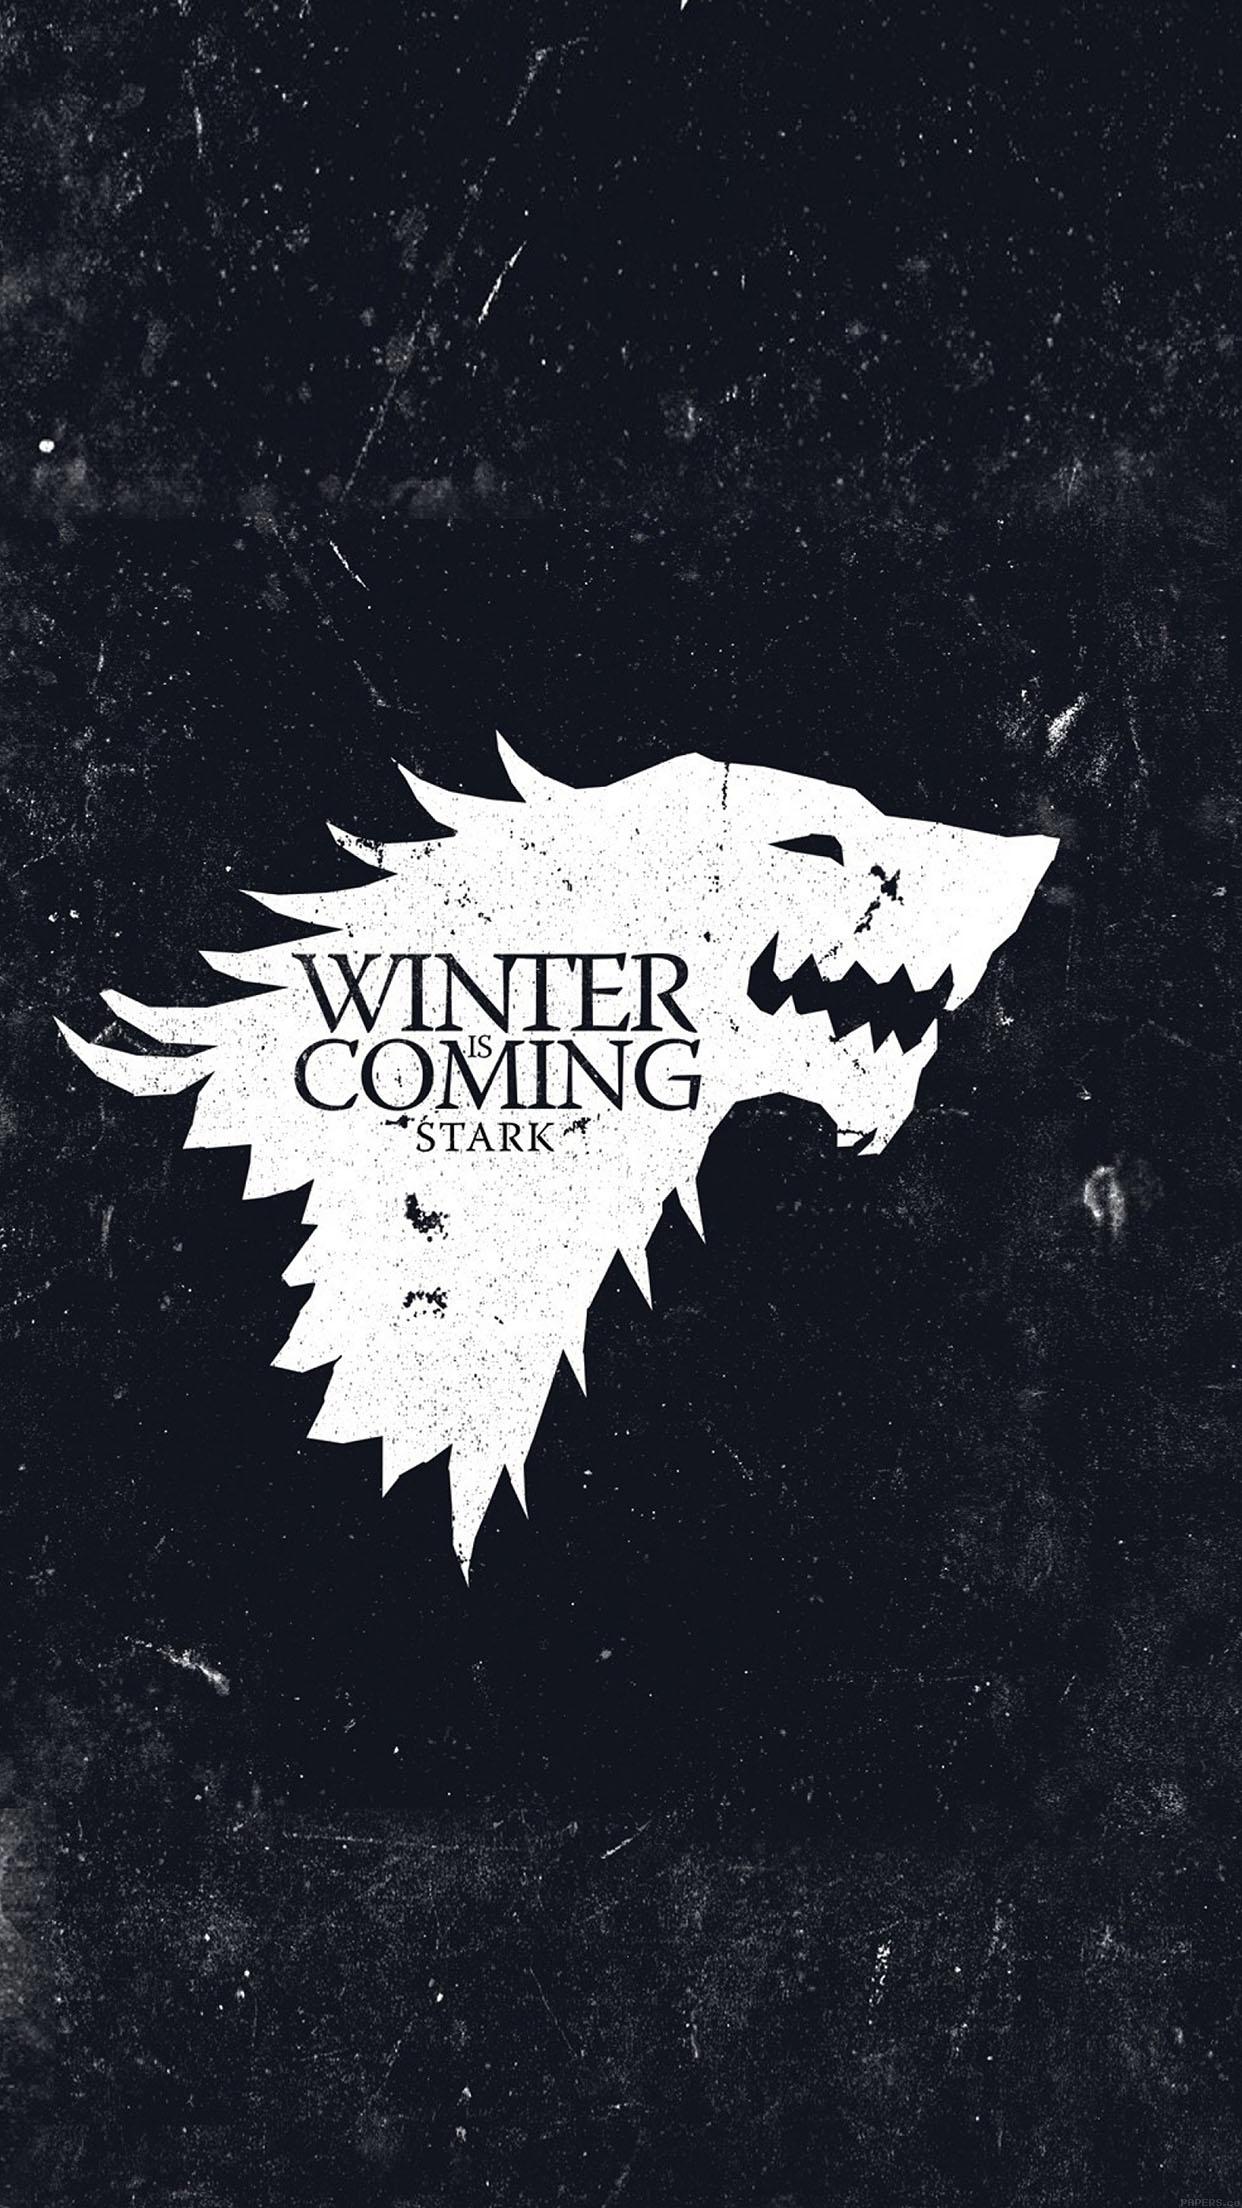 wallpaper game of thrones winter is coming 34 iphone6 plus wallpaper 1242x2208